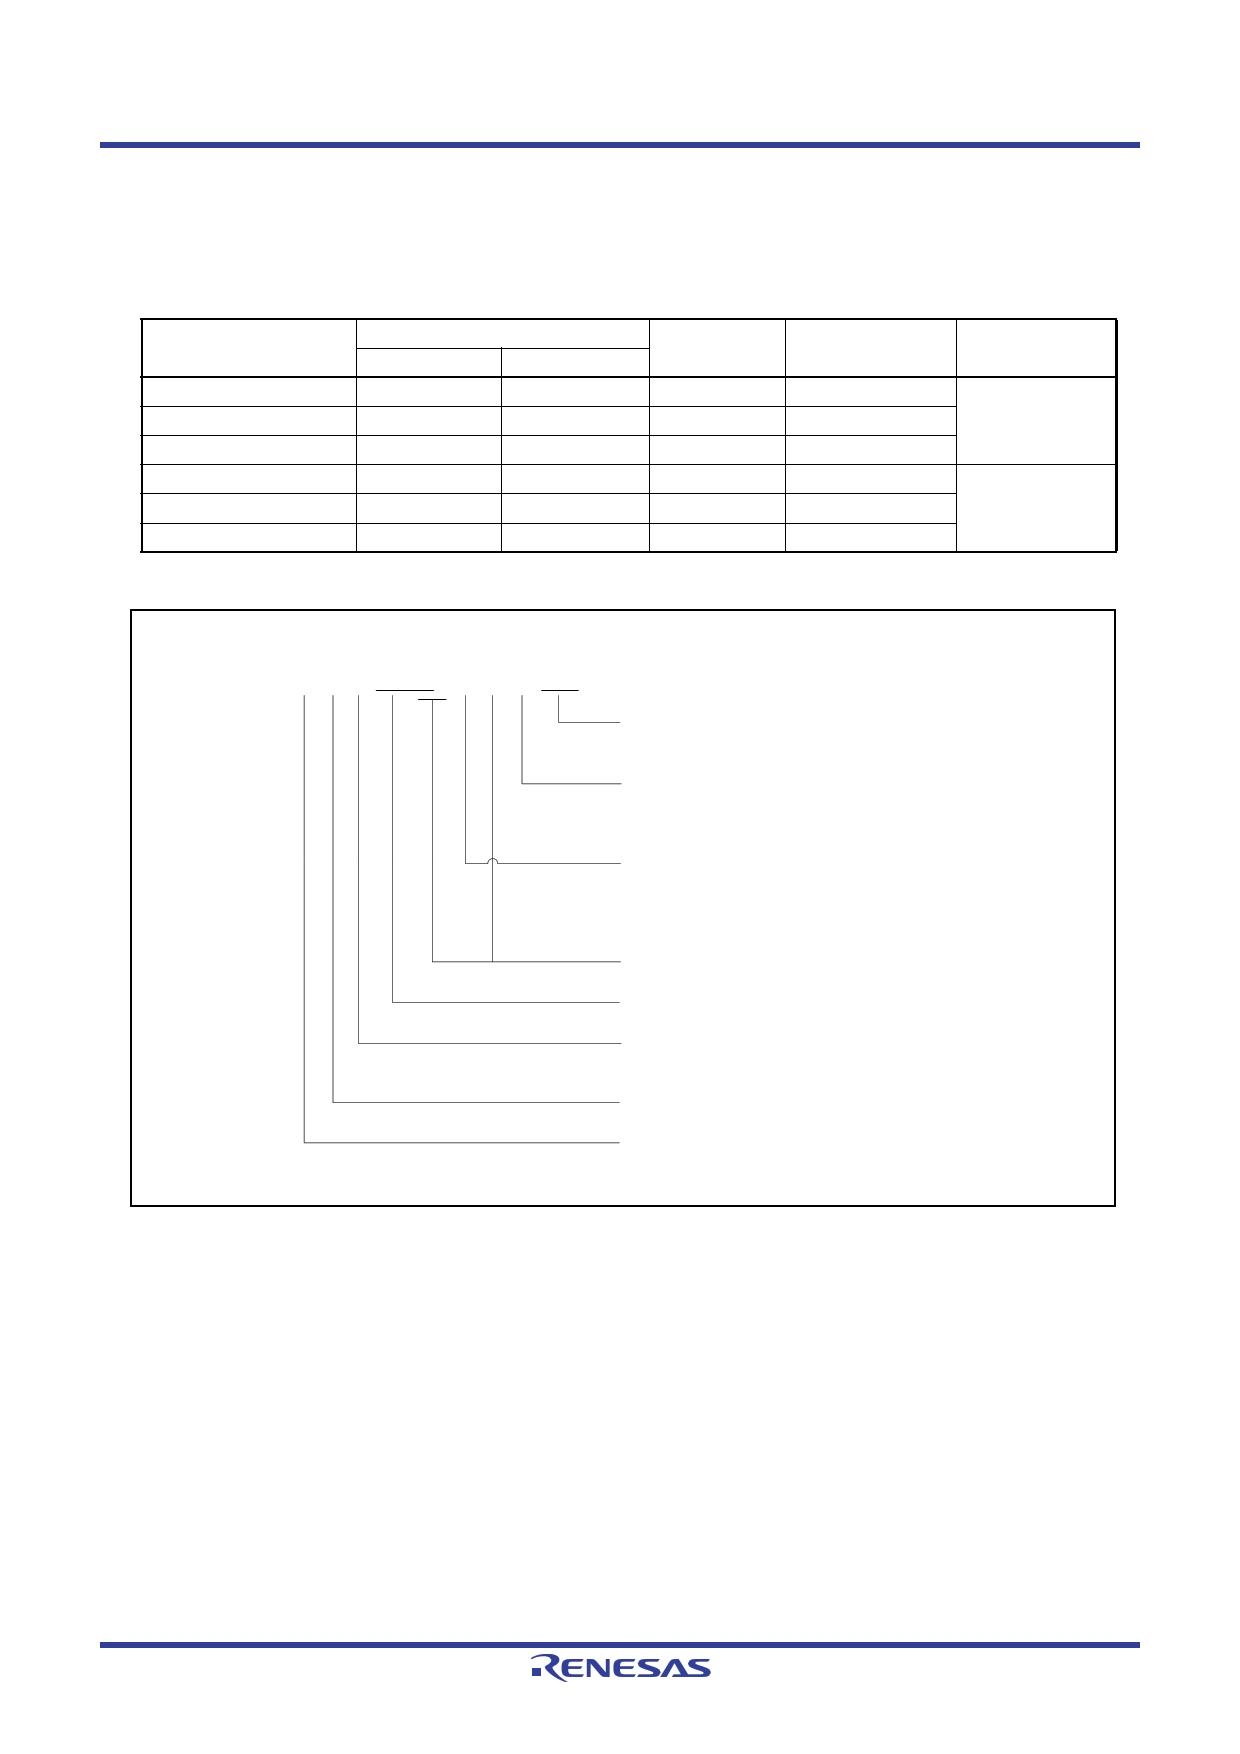 R5F21346CDFP pdf, 반도체, 판매, 대치품